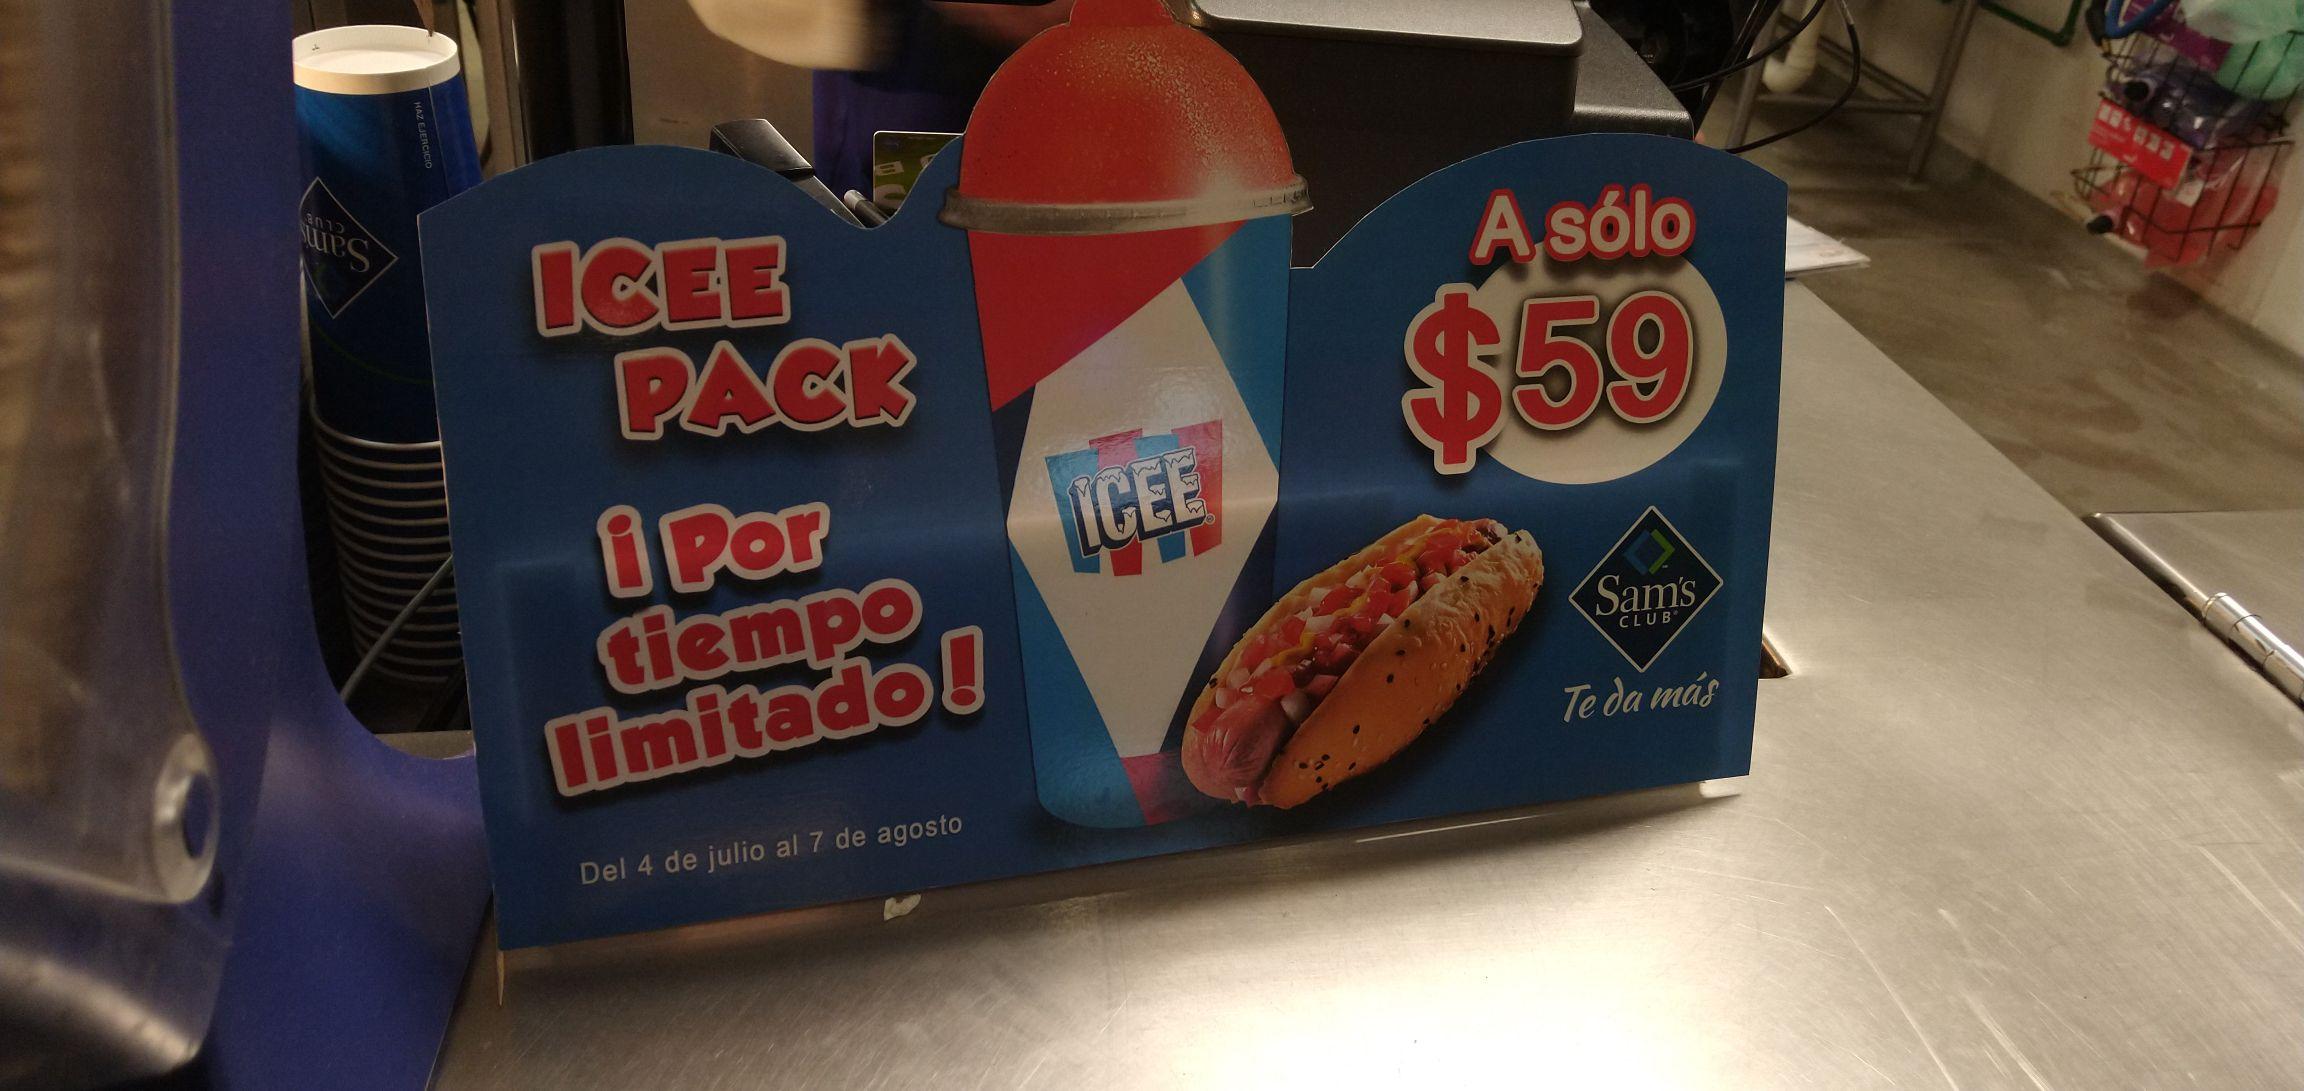 Sam's Club: Icee Pack (Icee + Hot dog)